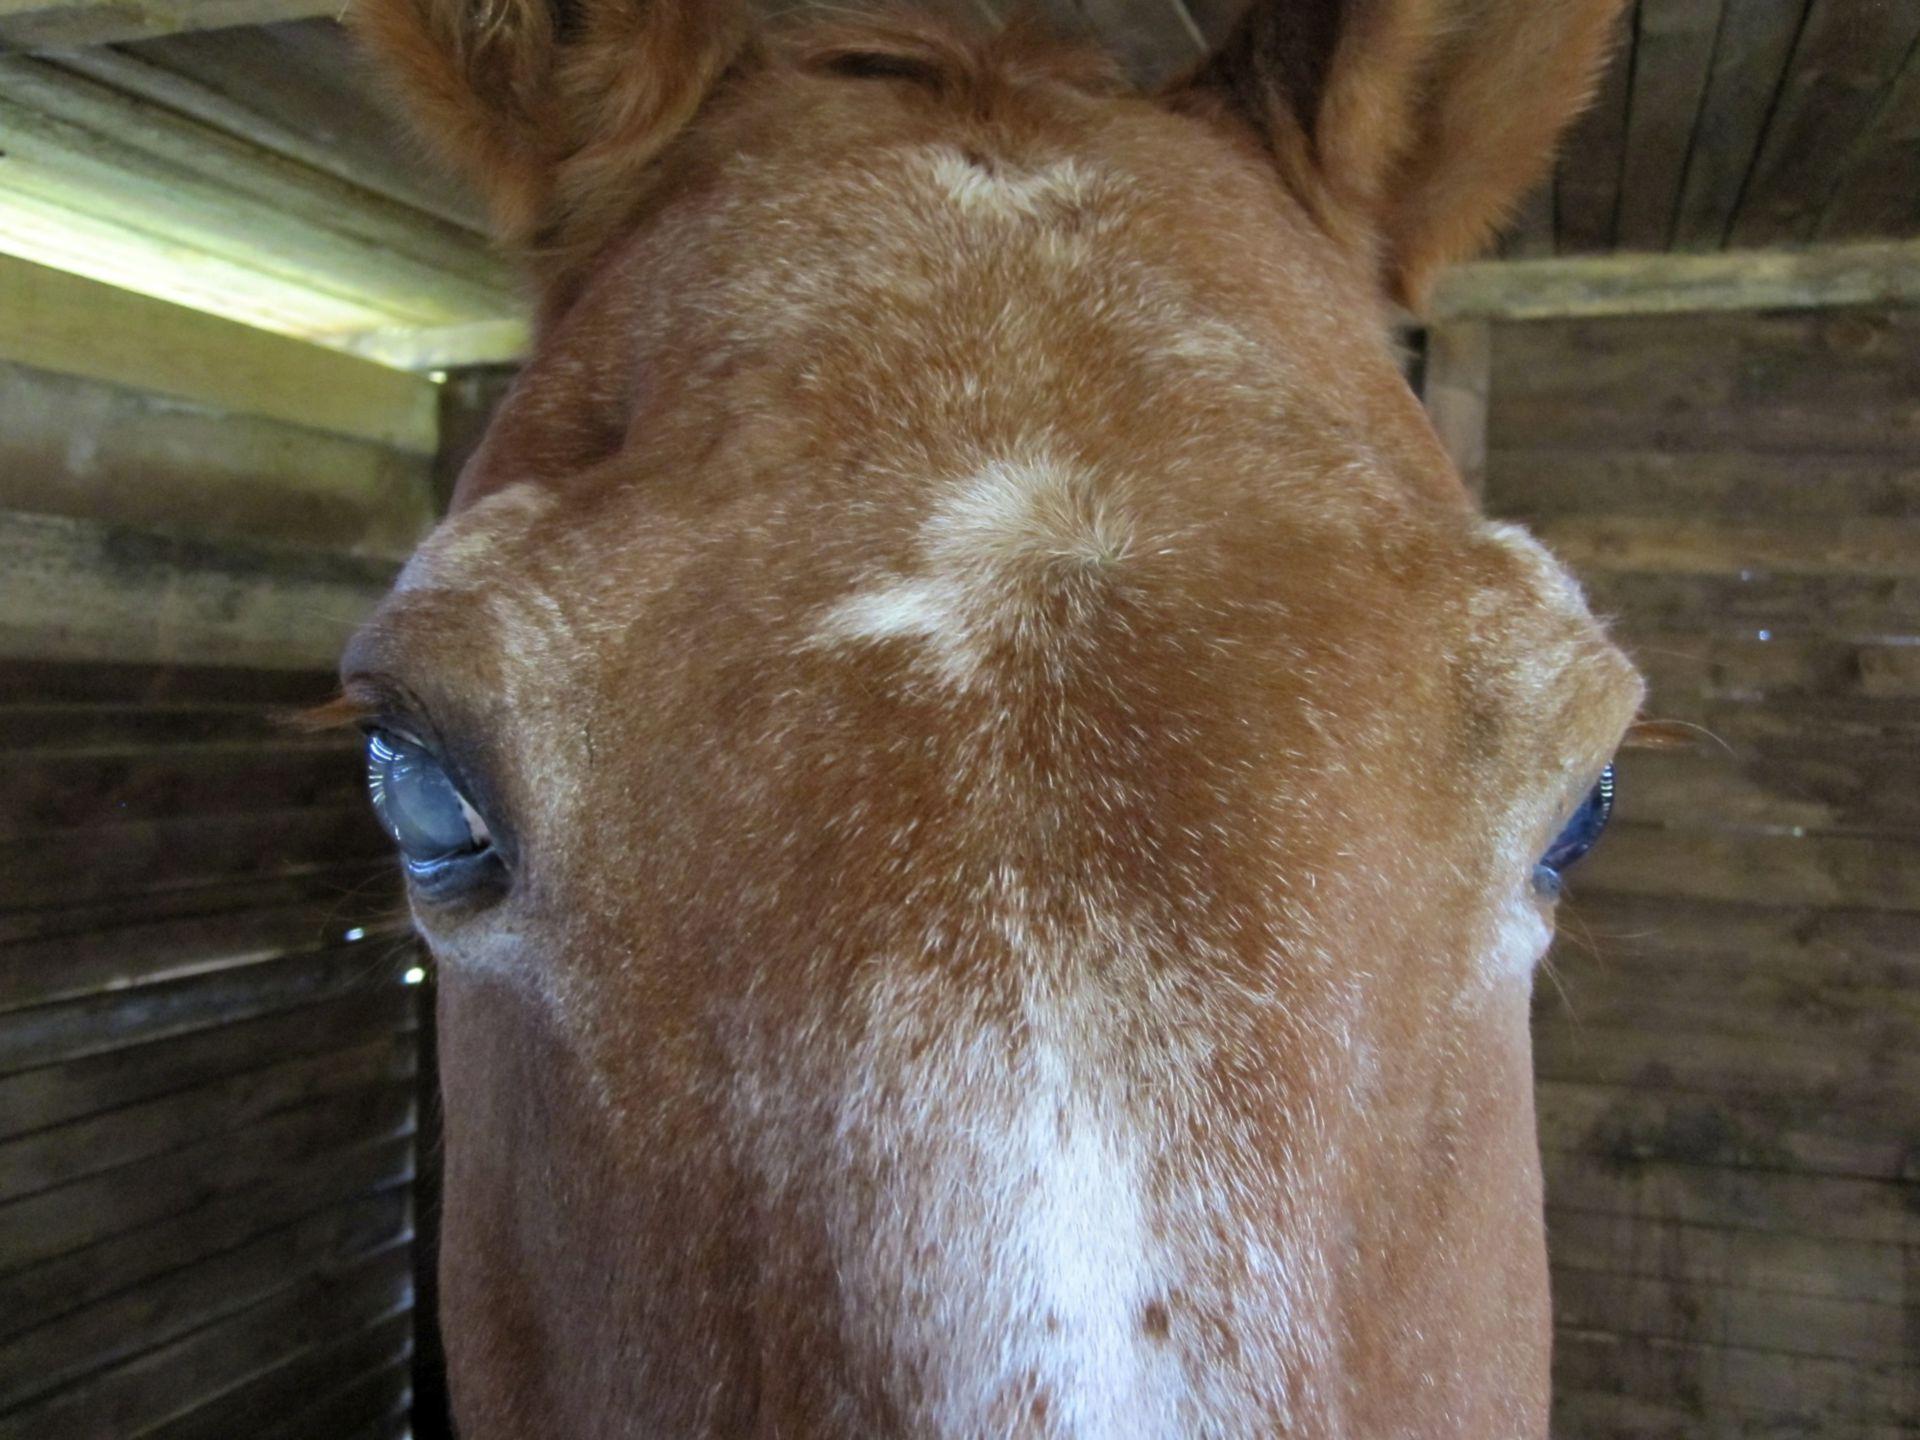 Pferdekopf mit Glaukom